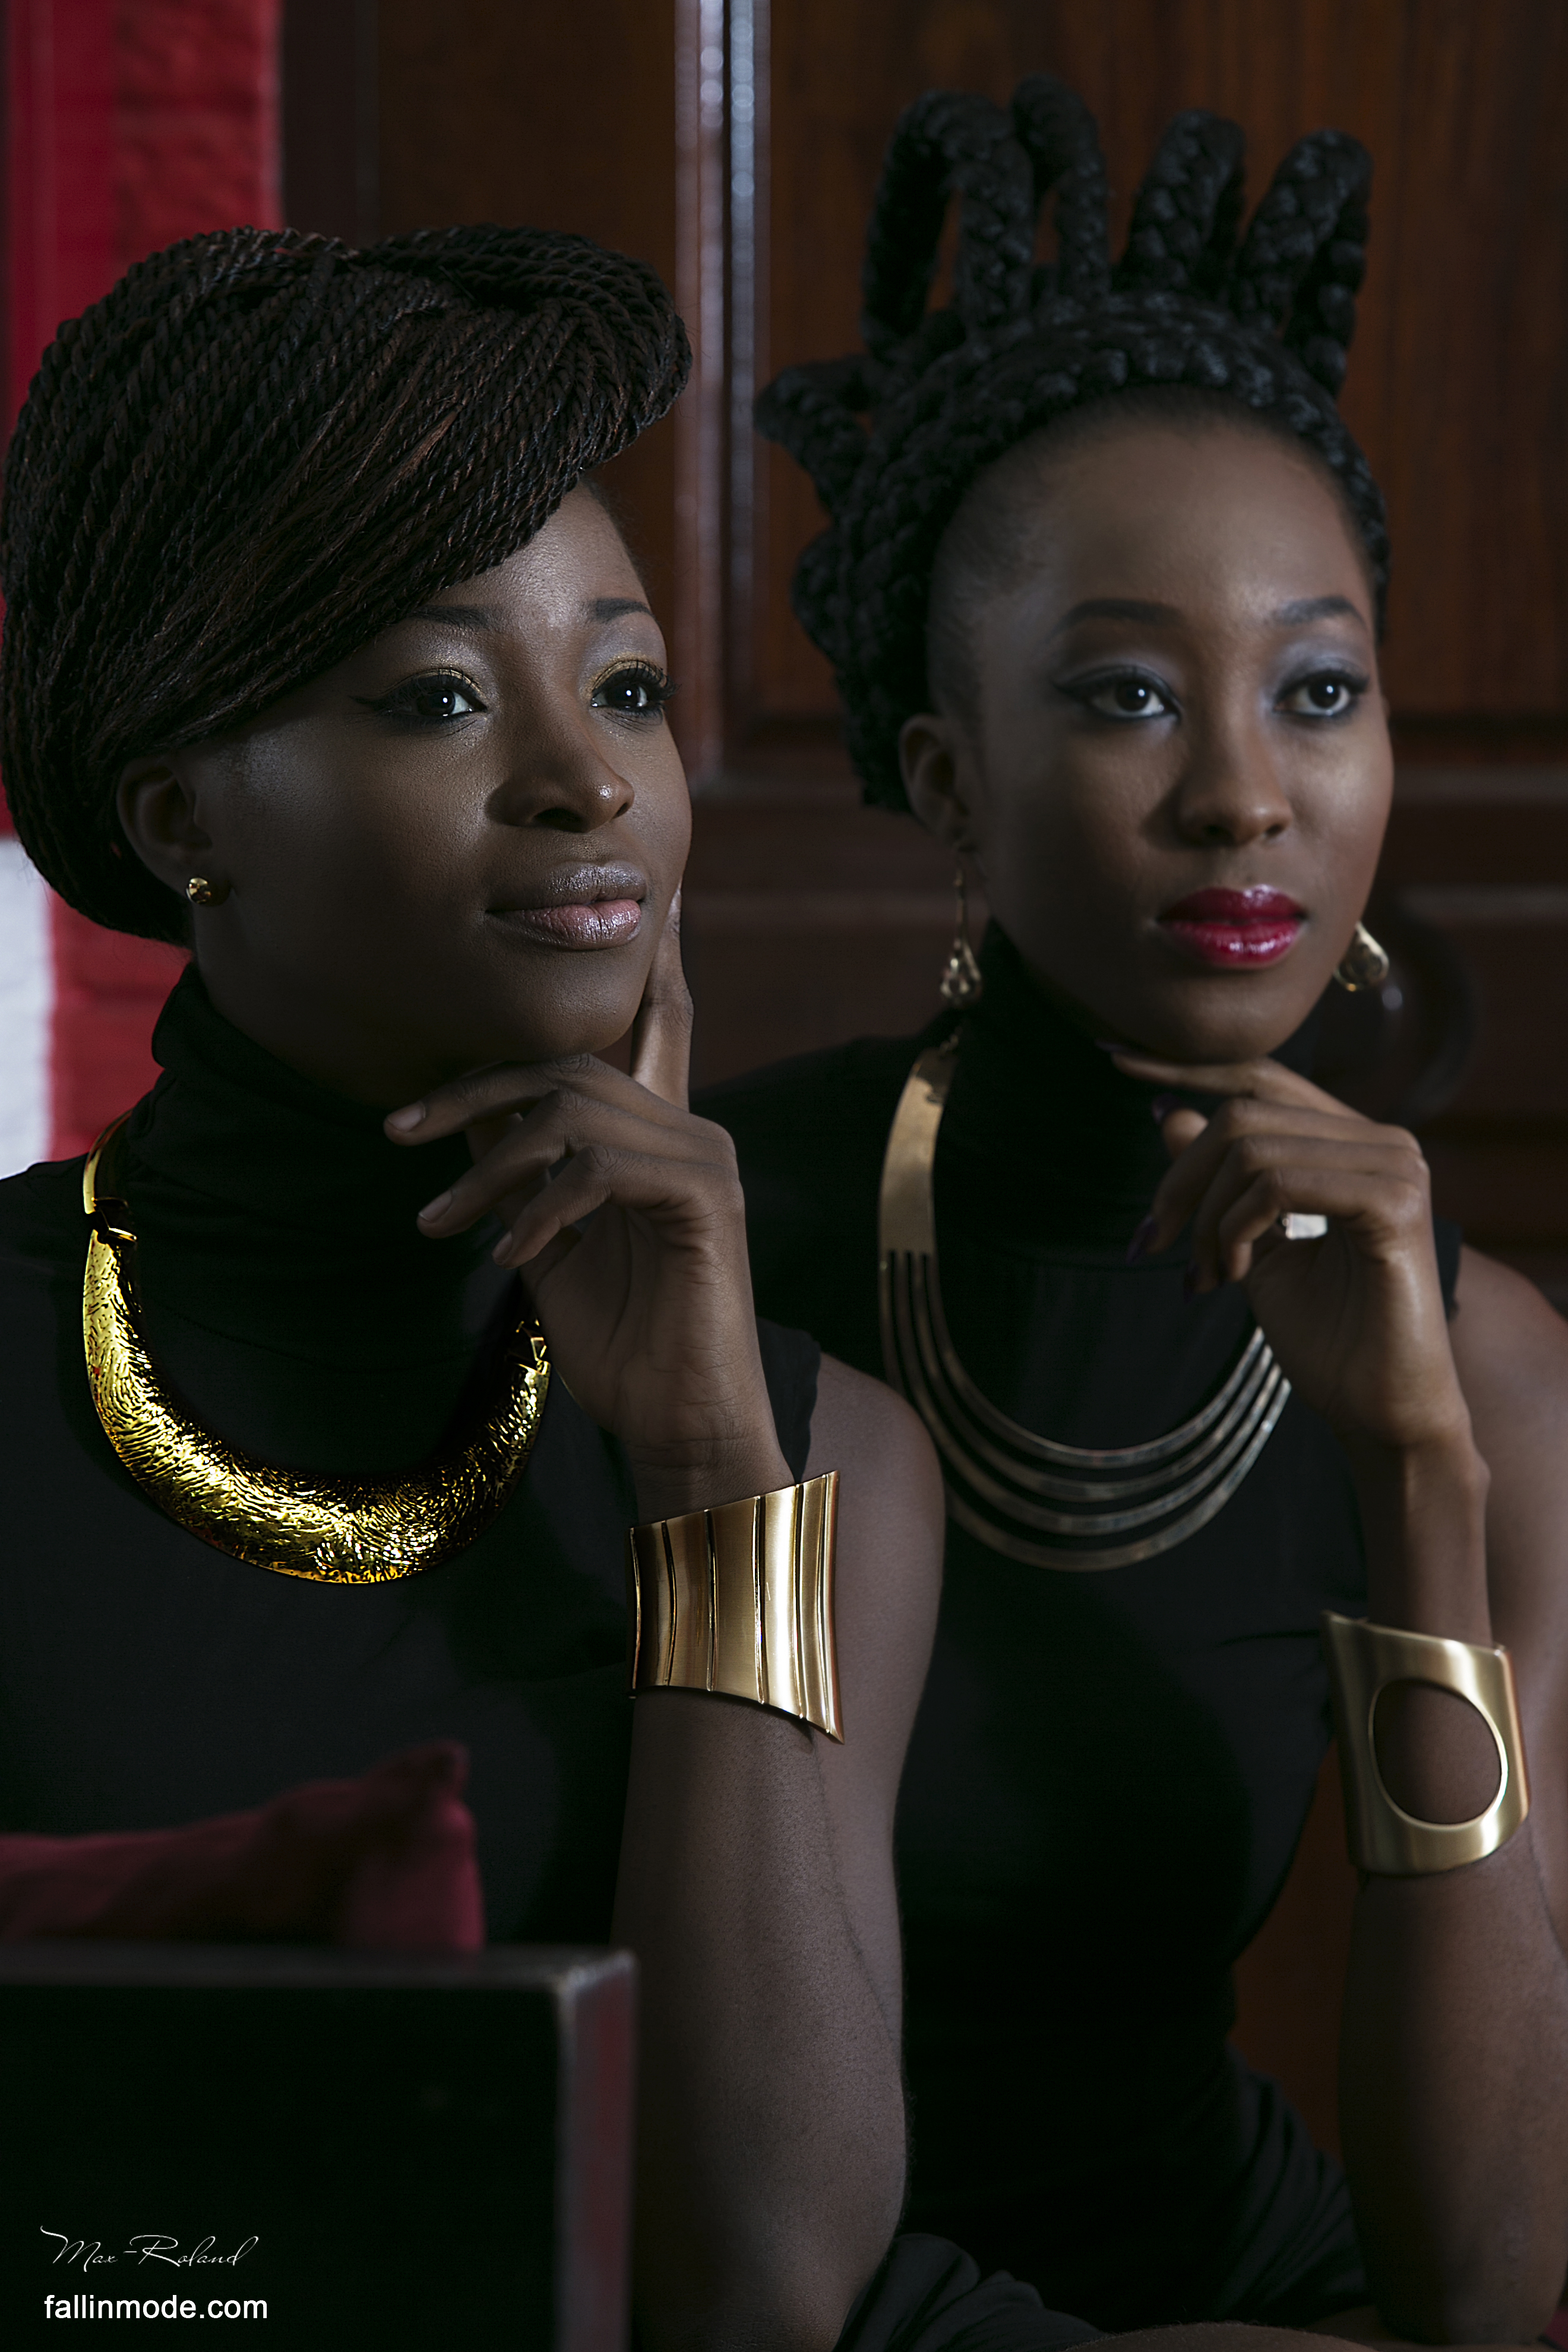 Sénato_Dieudonné_Coiffure_Hairstyle_Afrikfashion_mode_ivoirienne_Amenan_Tanoh_Makissa_Camara